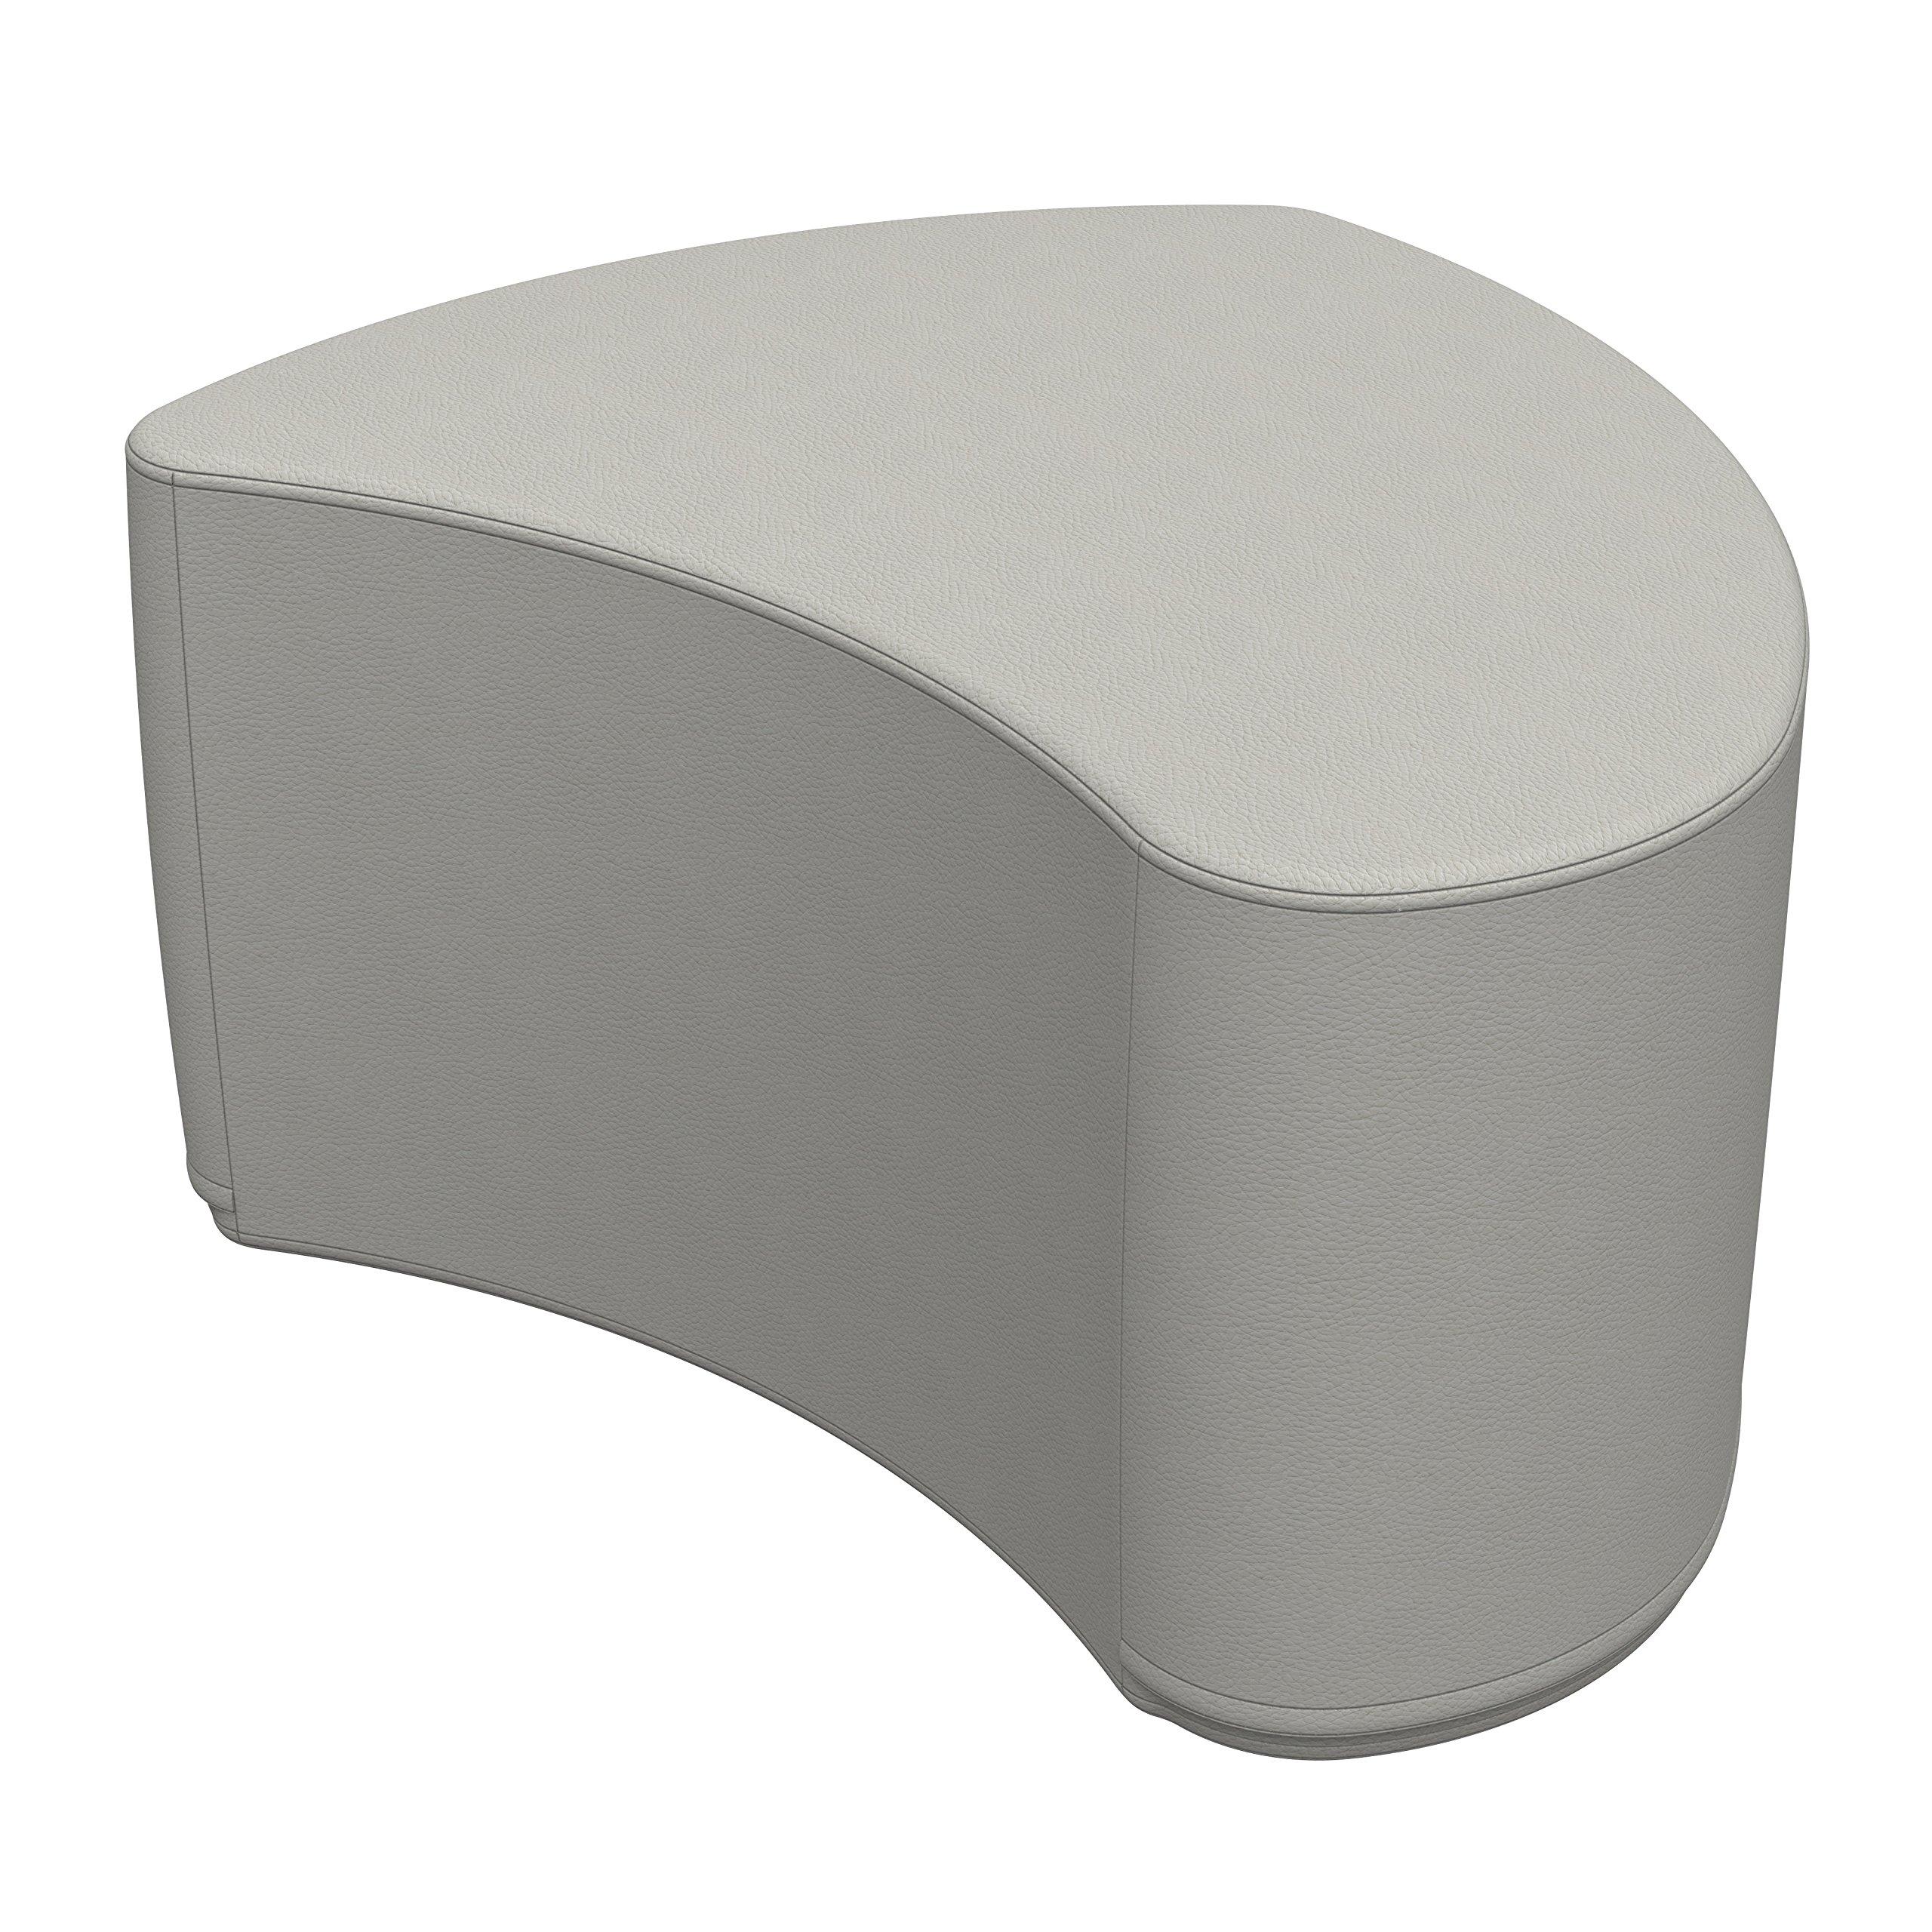 ECR4Kids Softzone Petal Ottoman - Furniture for Kids, Standard 16'' H, Light Grey